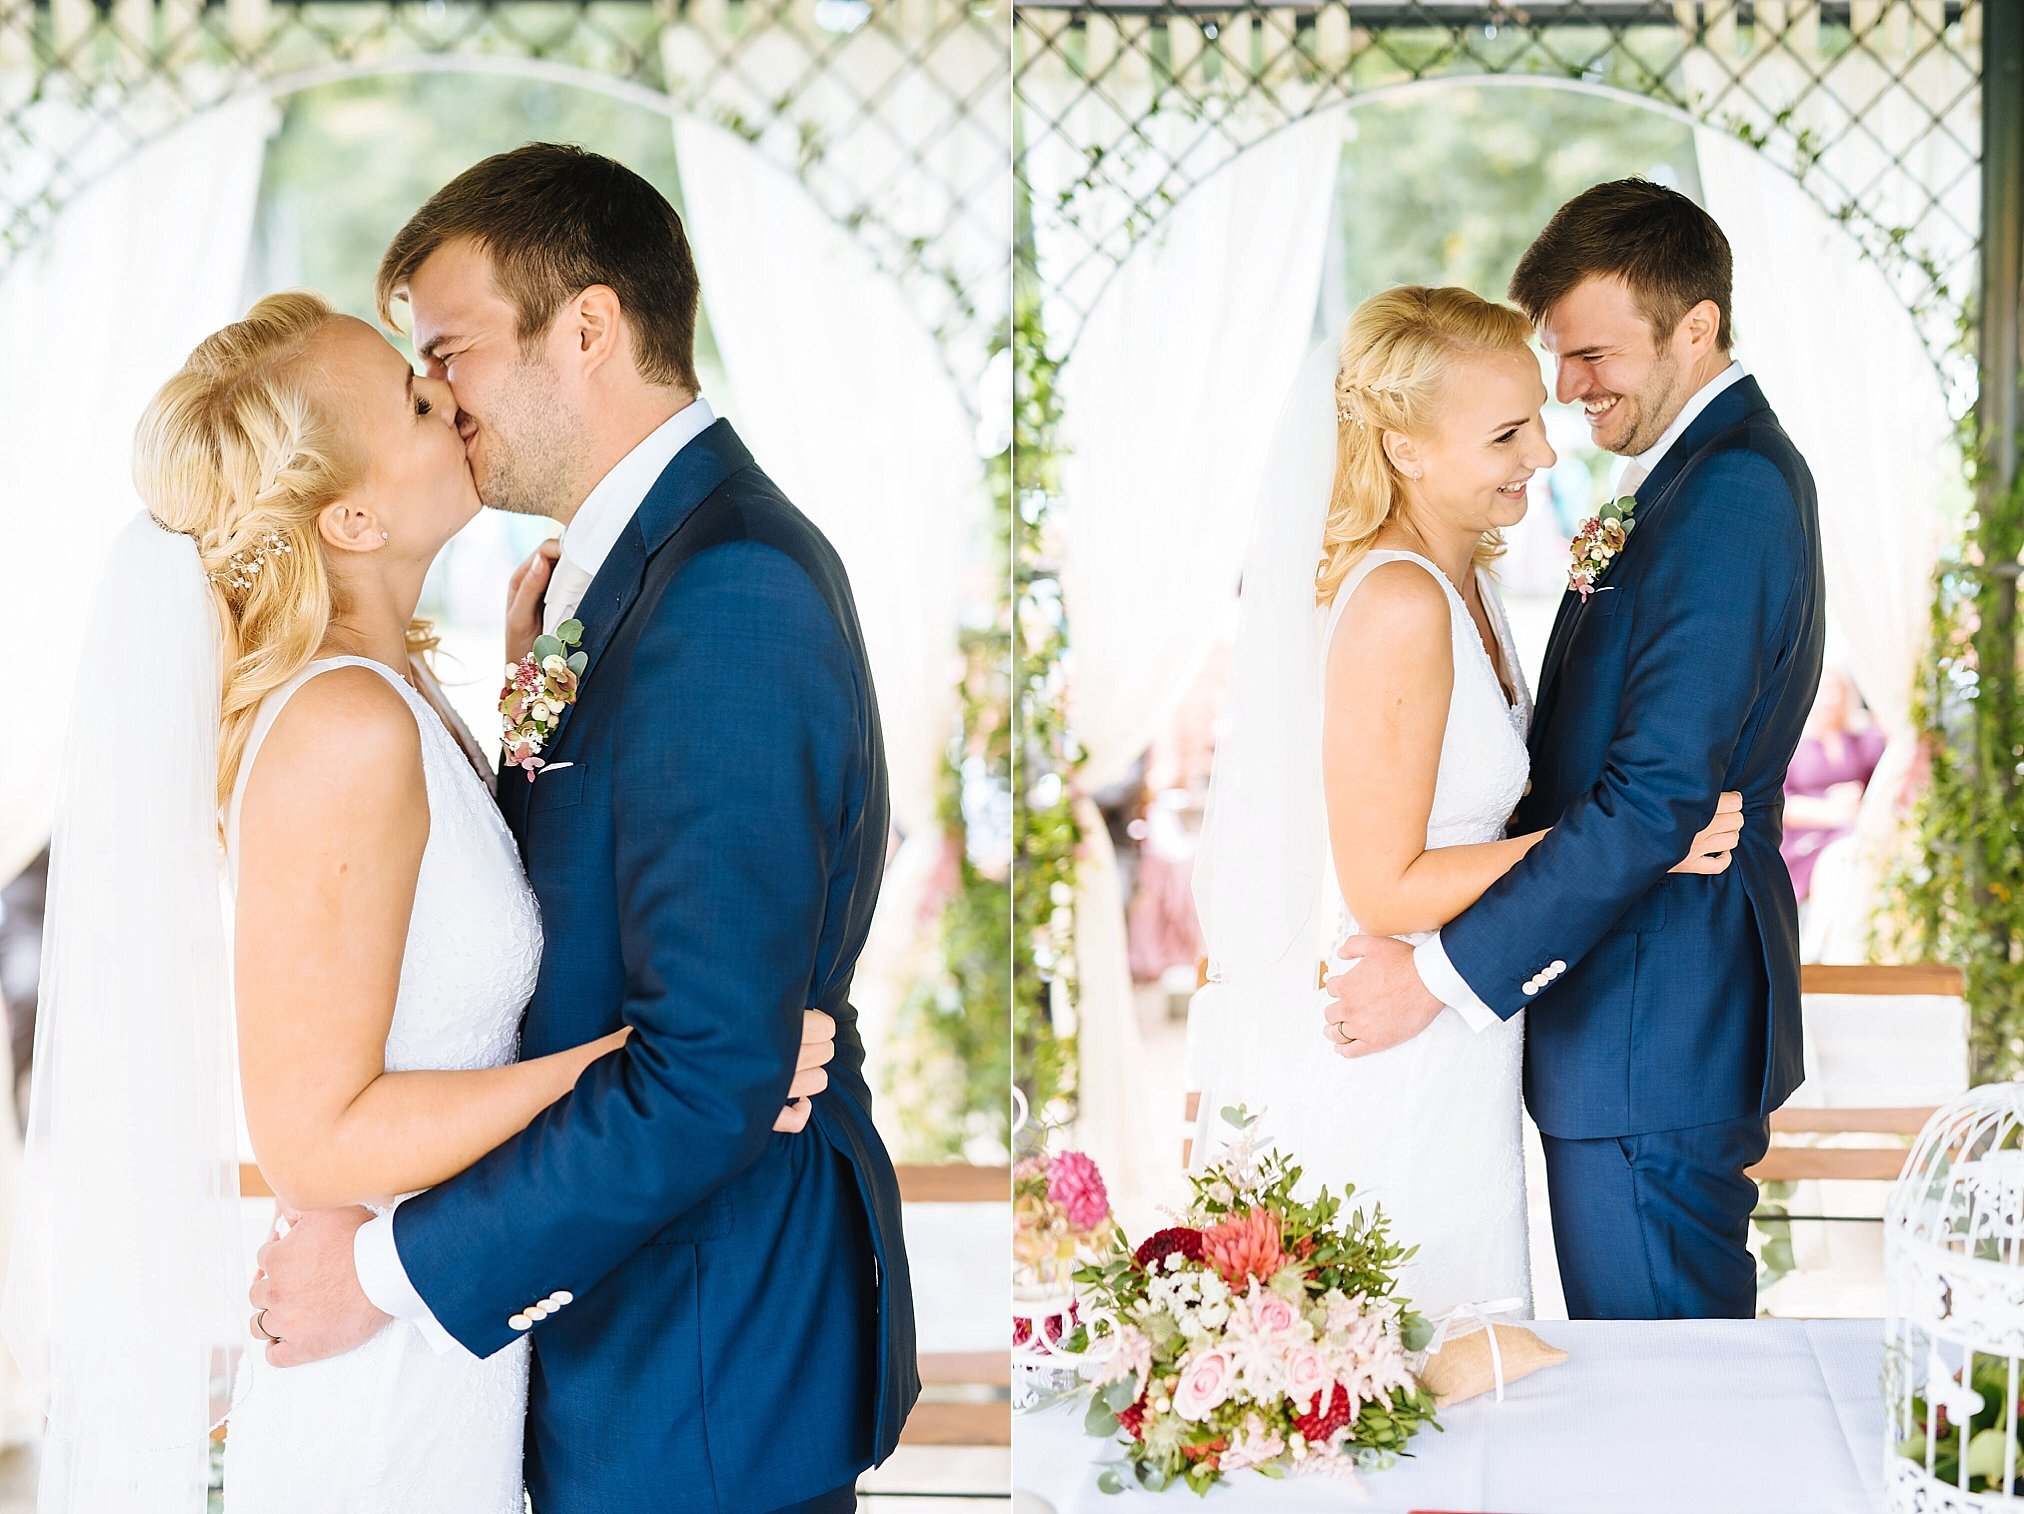 Hochzeit-Shloss-Grafenegg_0111.jpg